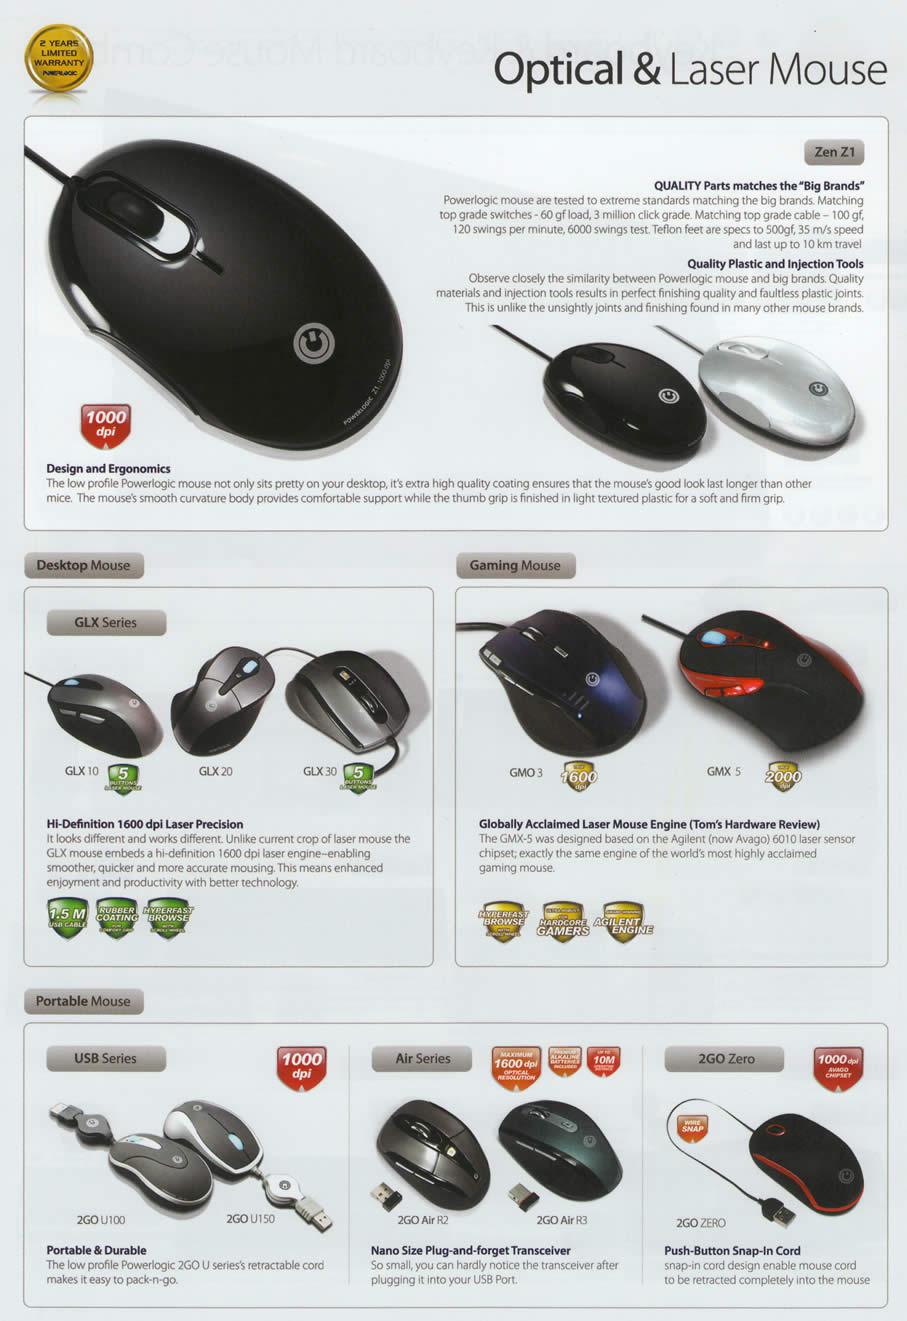 Comex 2009 price list image brochure of Powerlogic Mouse Optical Laser Zen Z1 GLX USB Air 2GO Zero